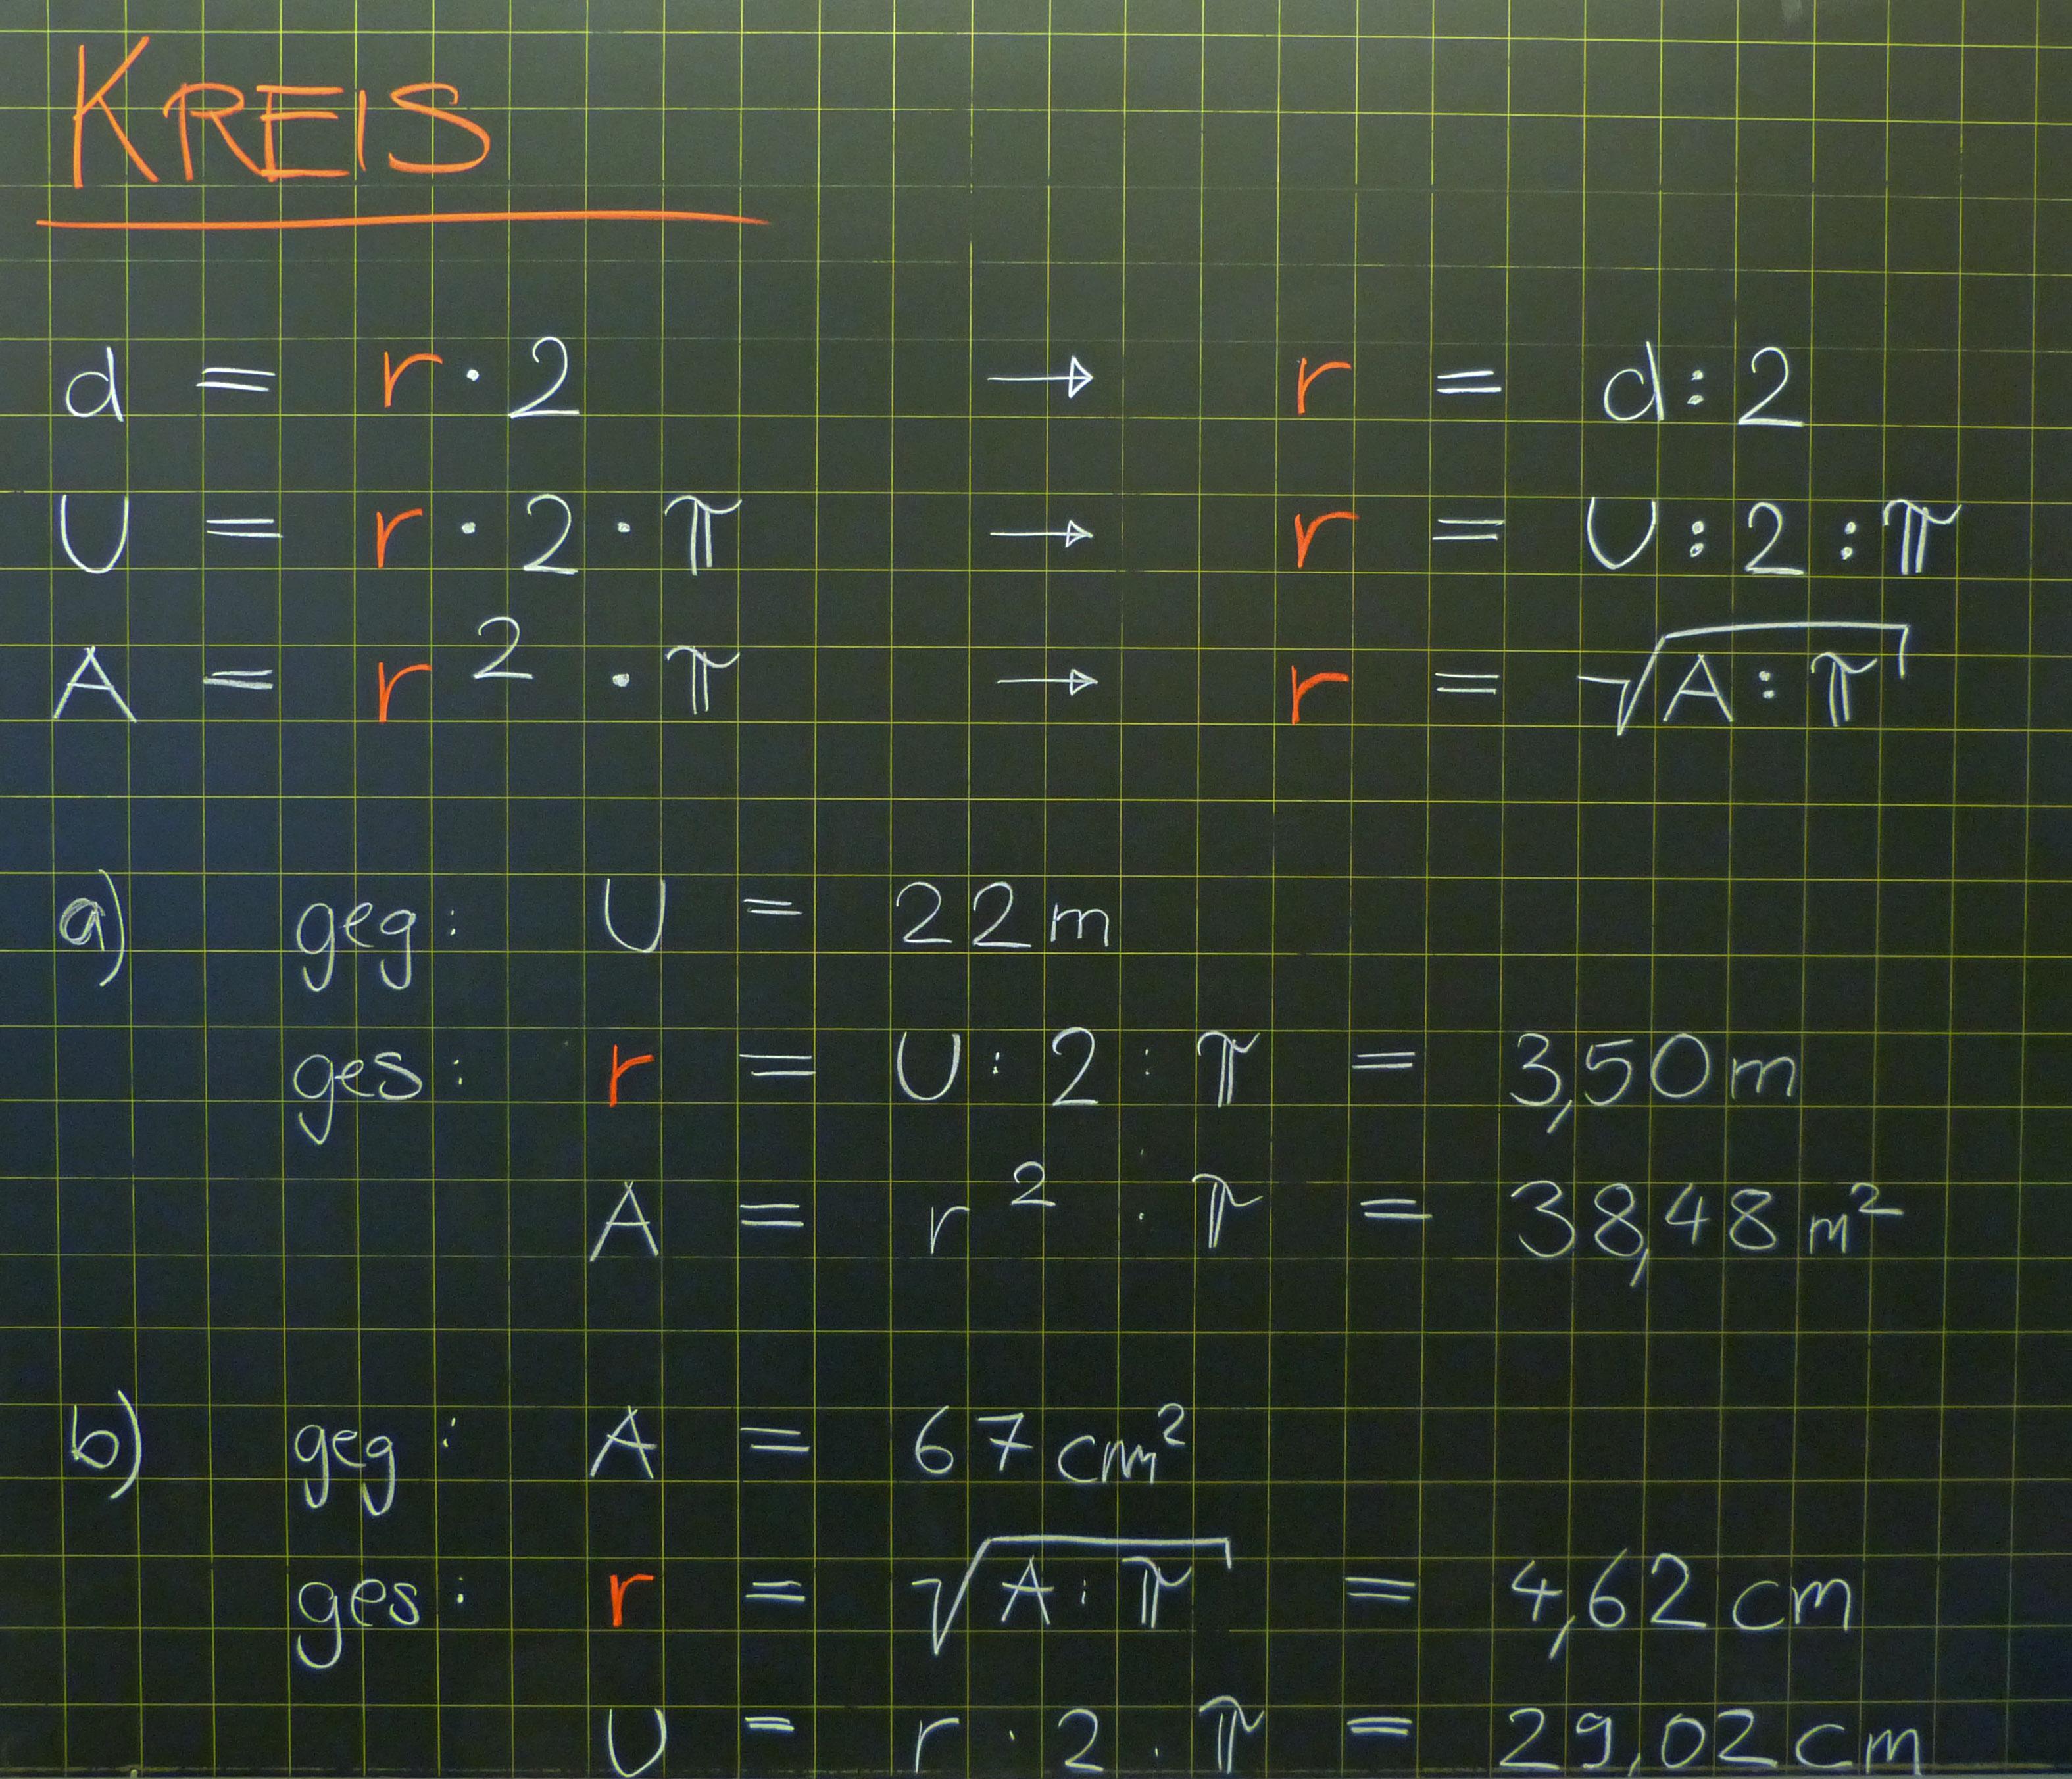 mathematik geometrie tafelbilder kreis berechnung. Black Bedroom Furniture Sets. Home Design Ideas